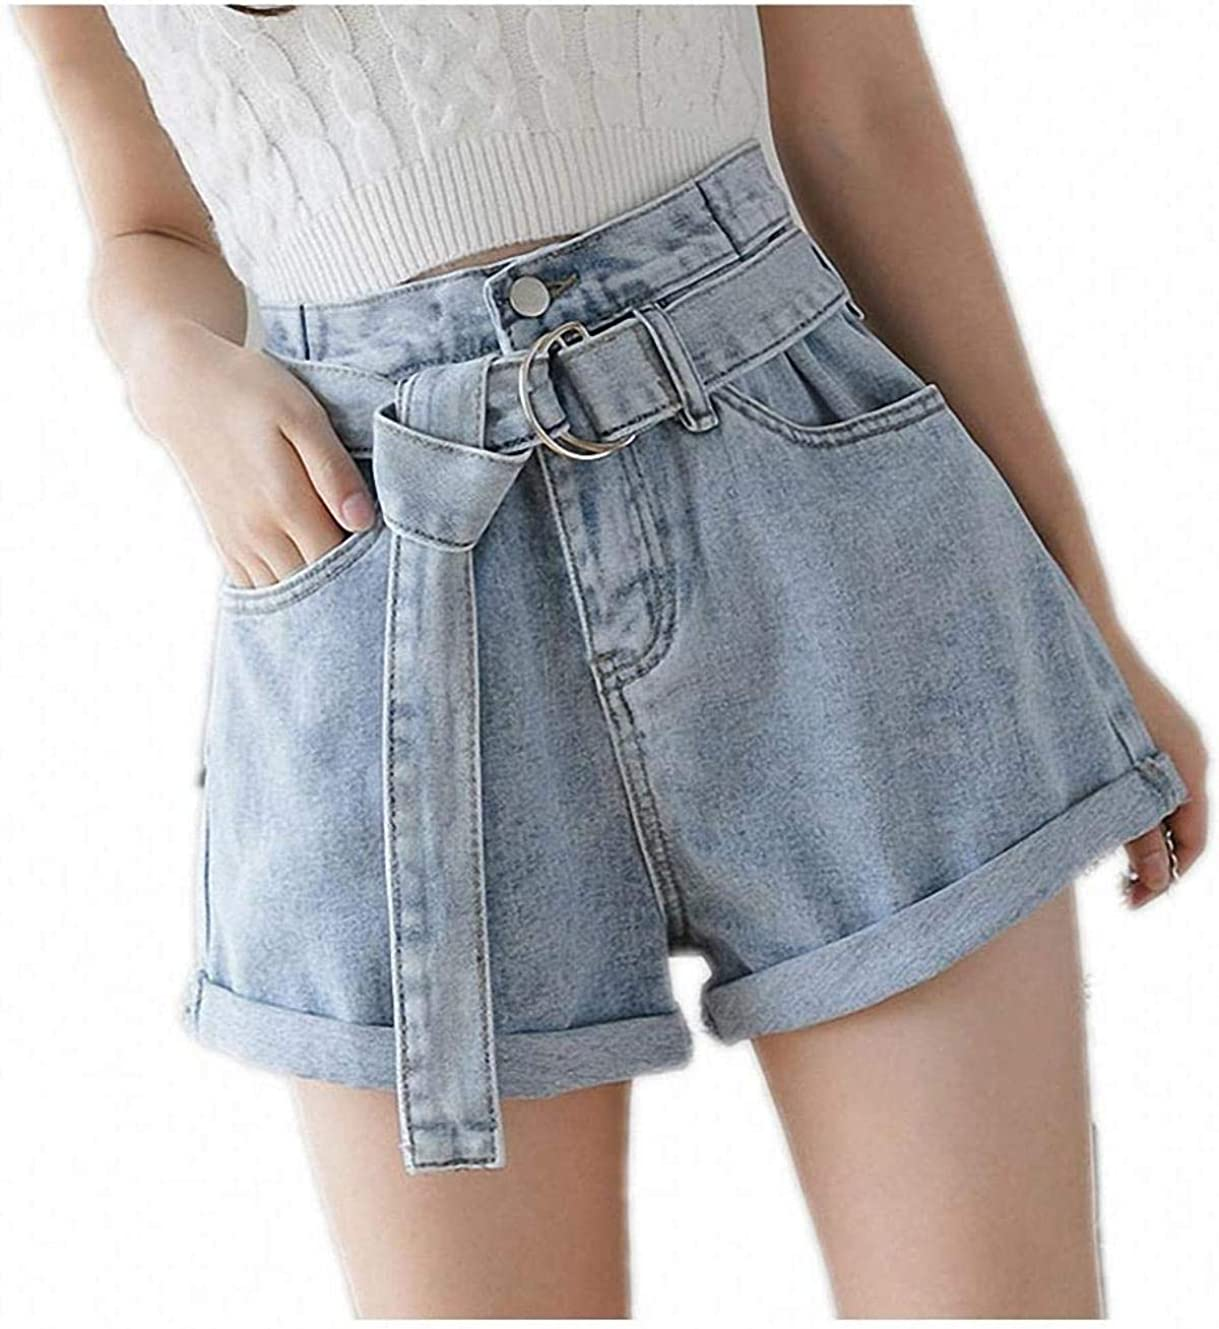 Tayaho Summer Jeans for Women Denim Shorts Vintage High Waist Blue Wide Leg Ladies Shorts